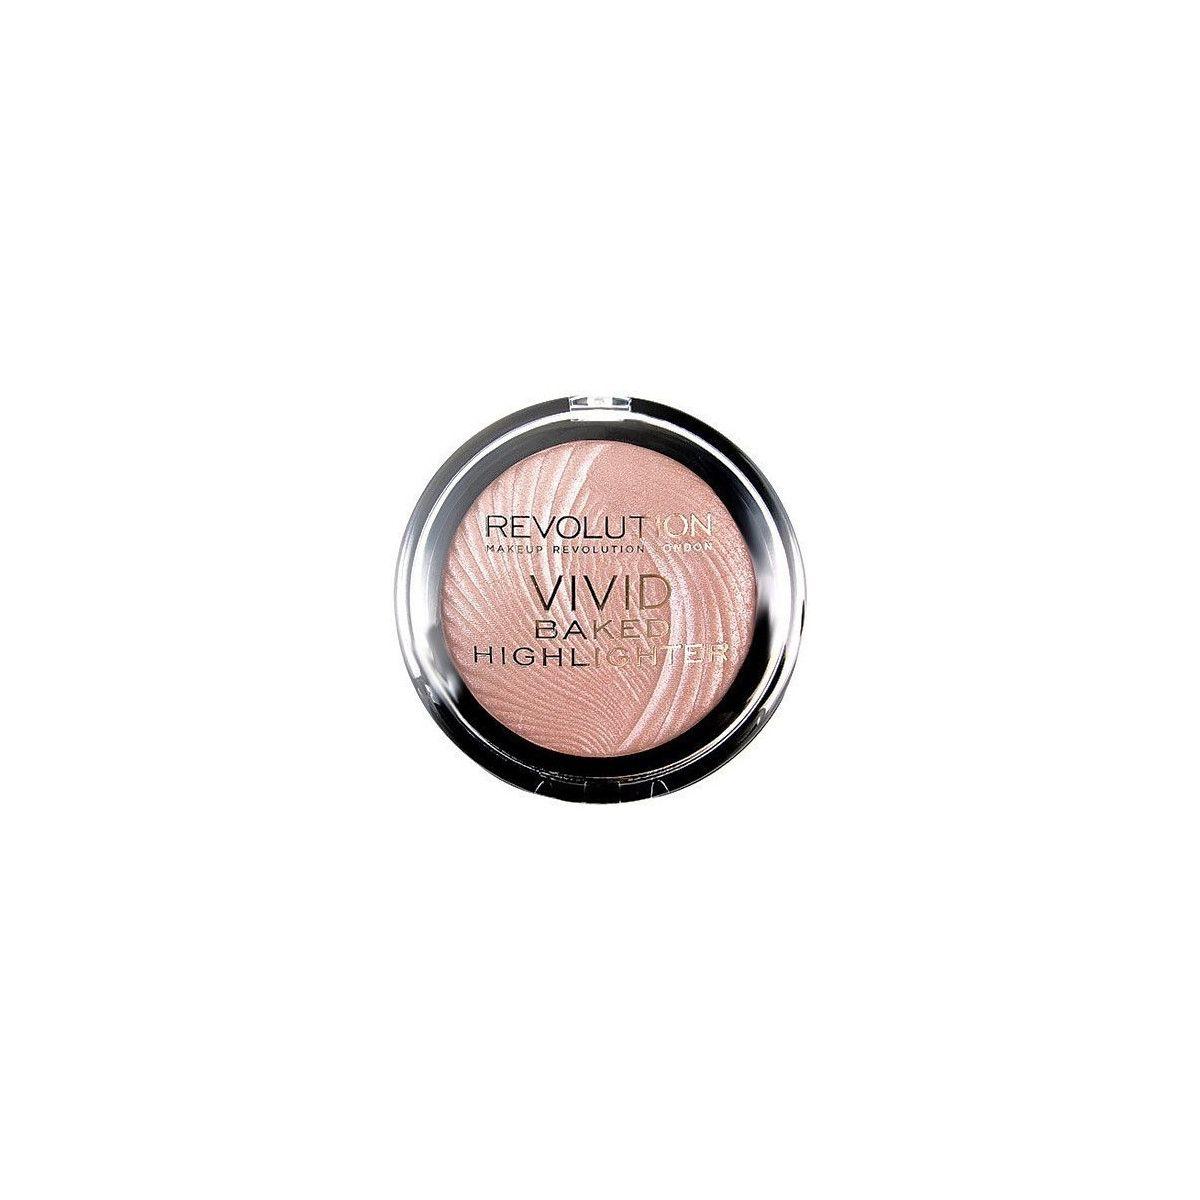 Makeup Revolution VIVID Baked Highlighter Peach Lights, brzoskwiniowy rozświetlasz 7,5g